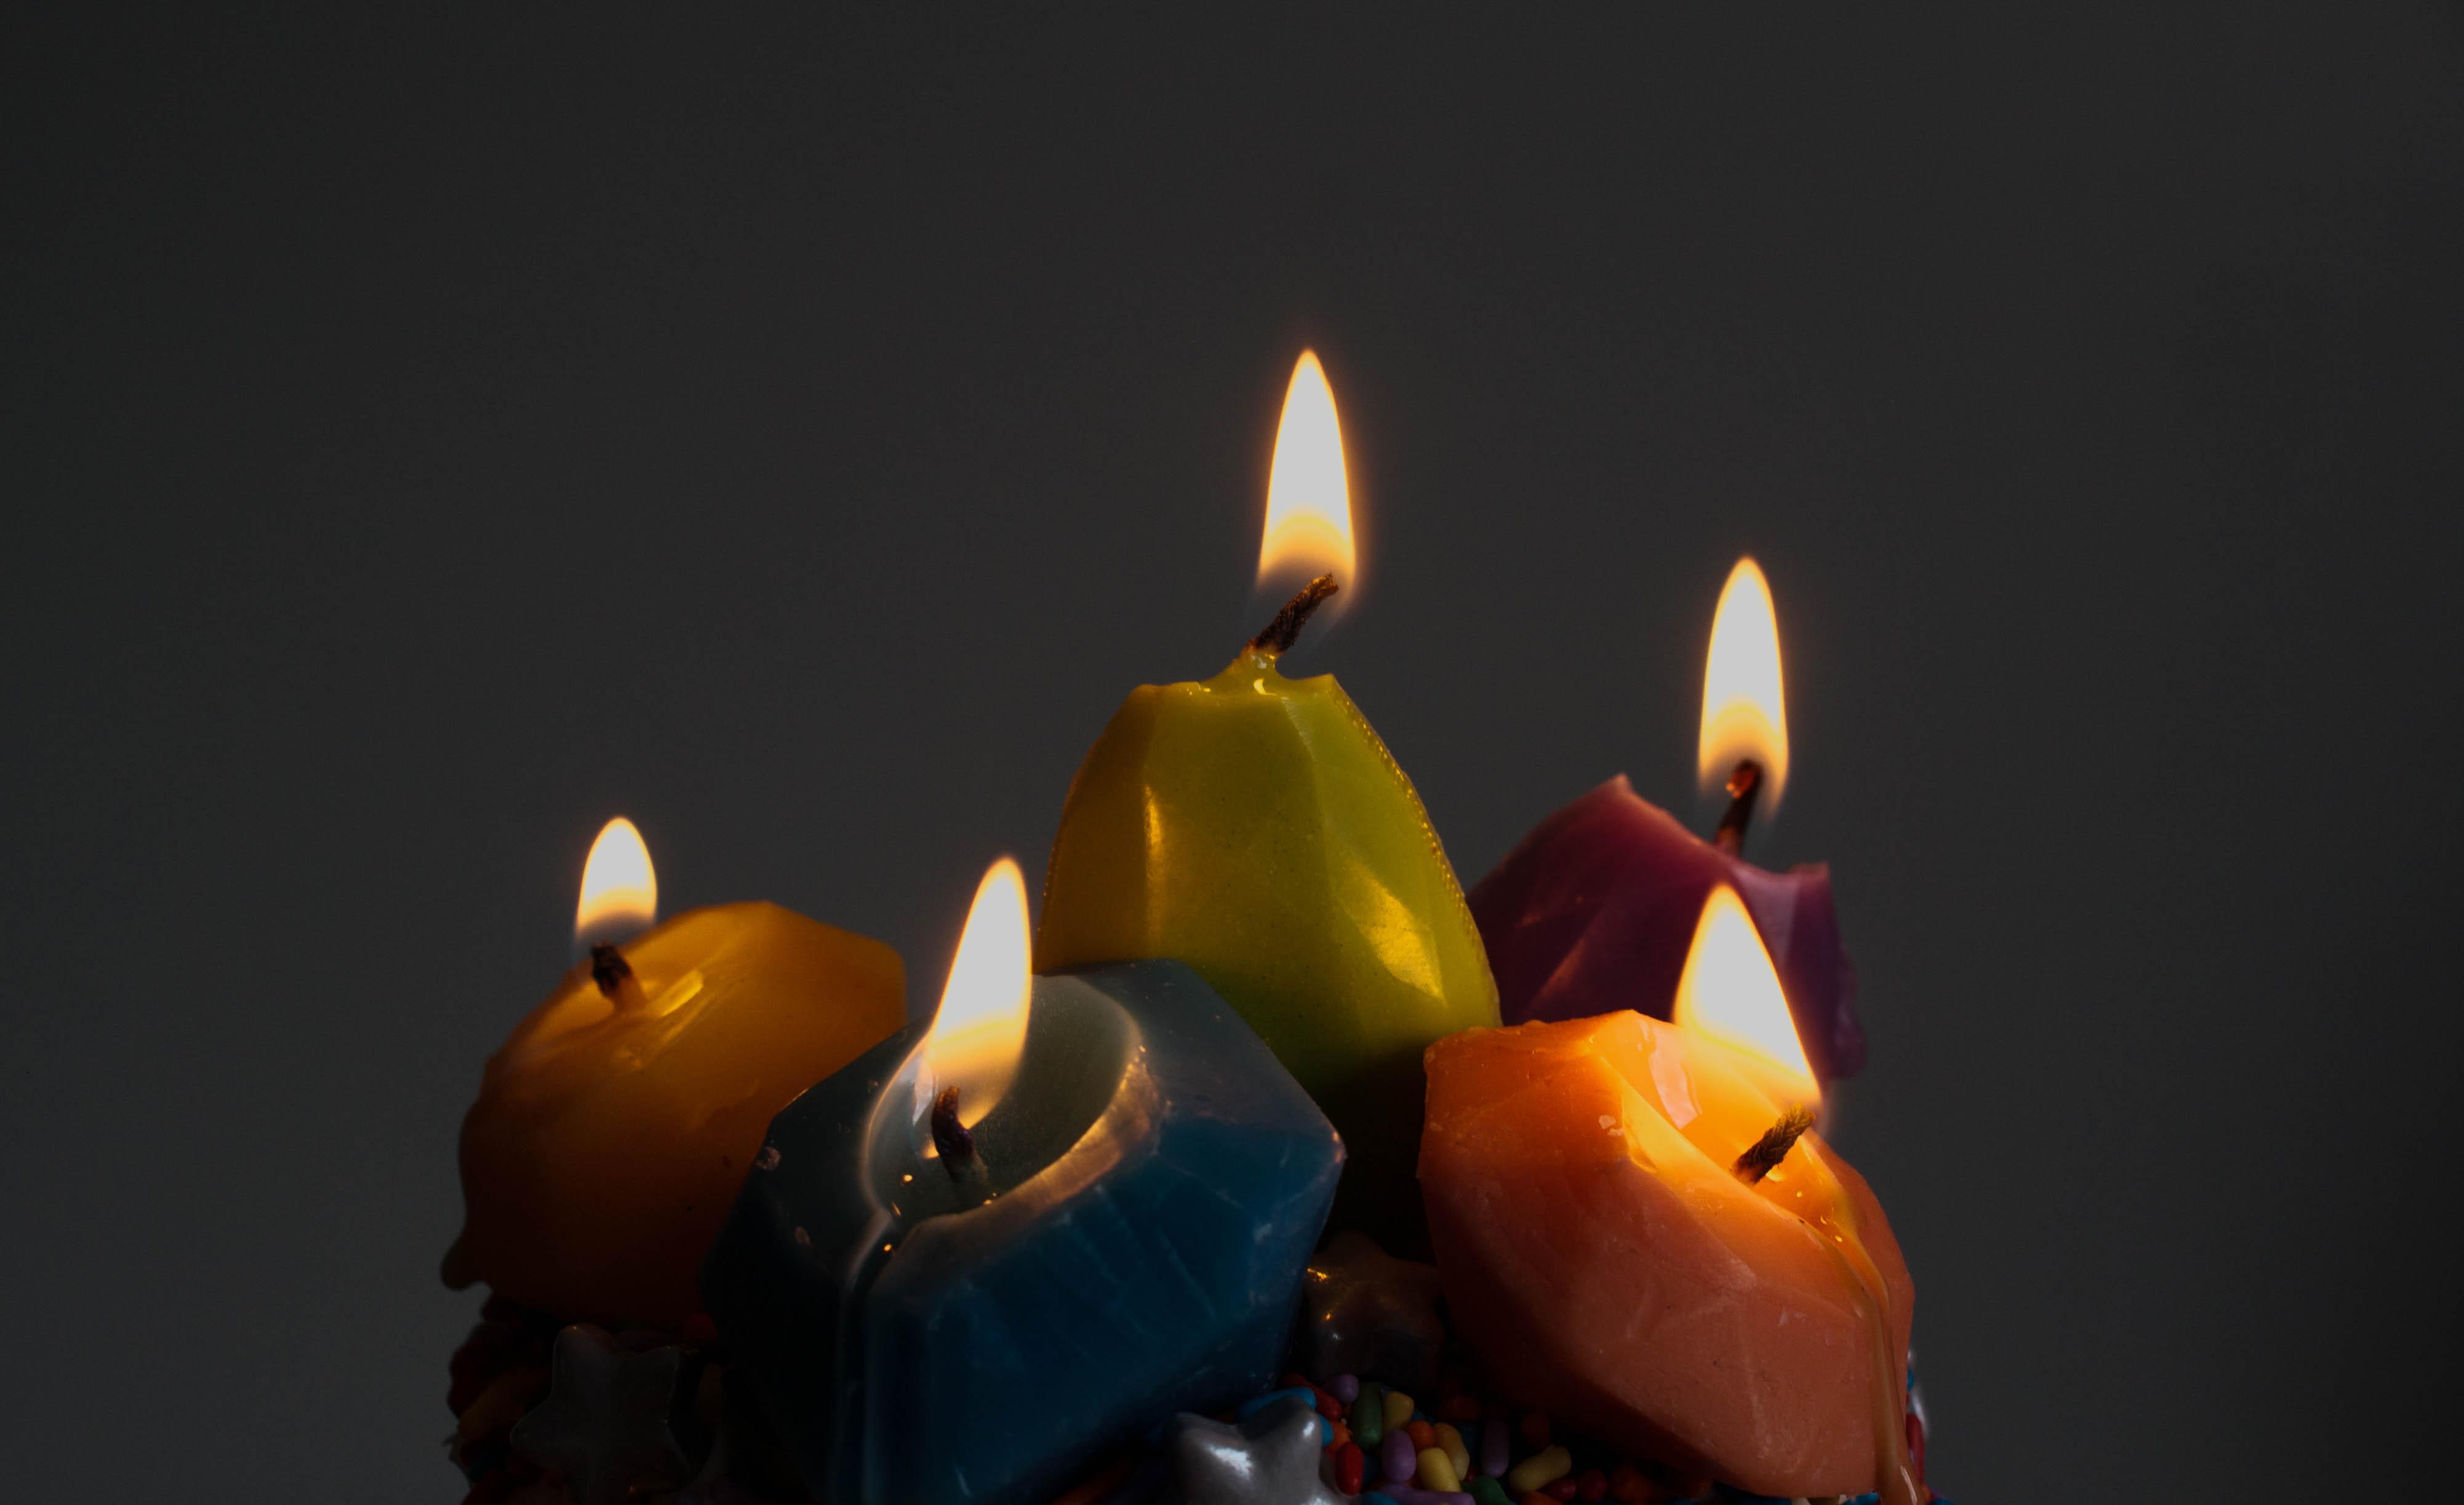 Custom Beeswax Candles | Erin Bakes